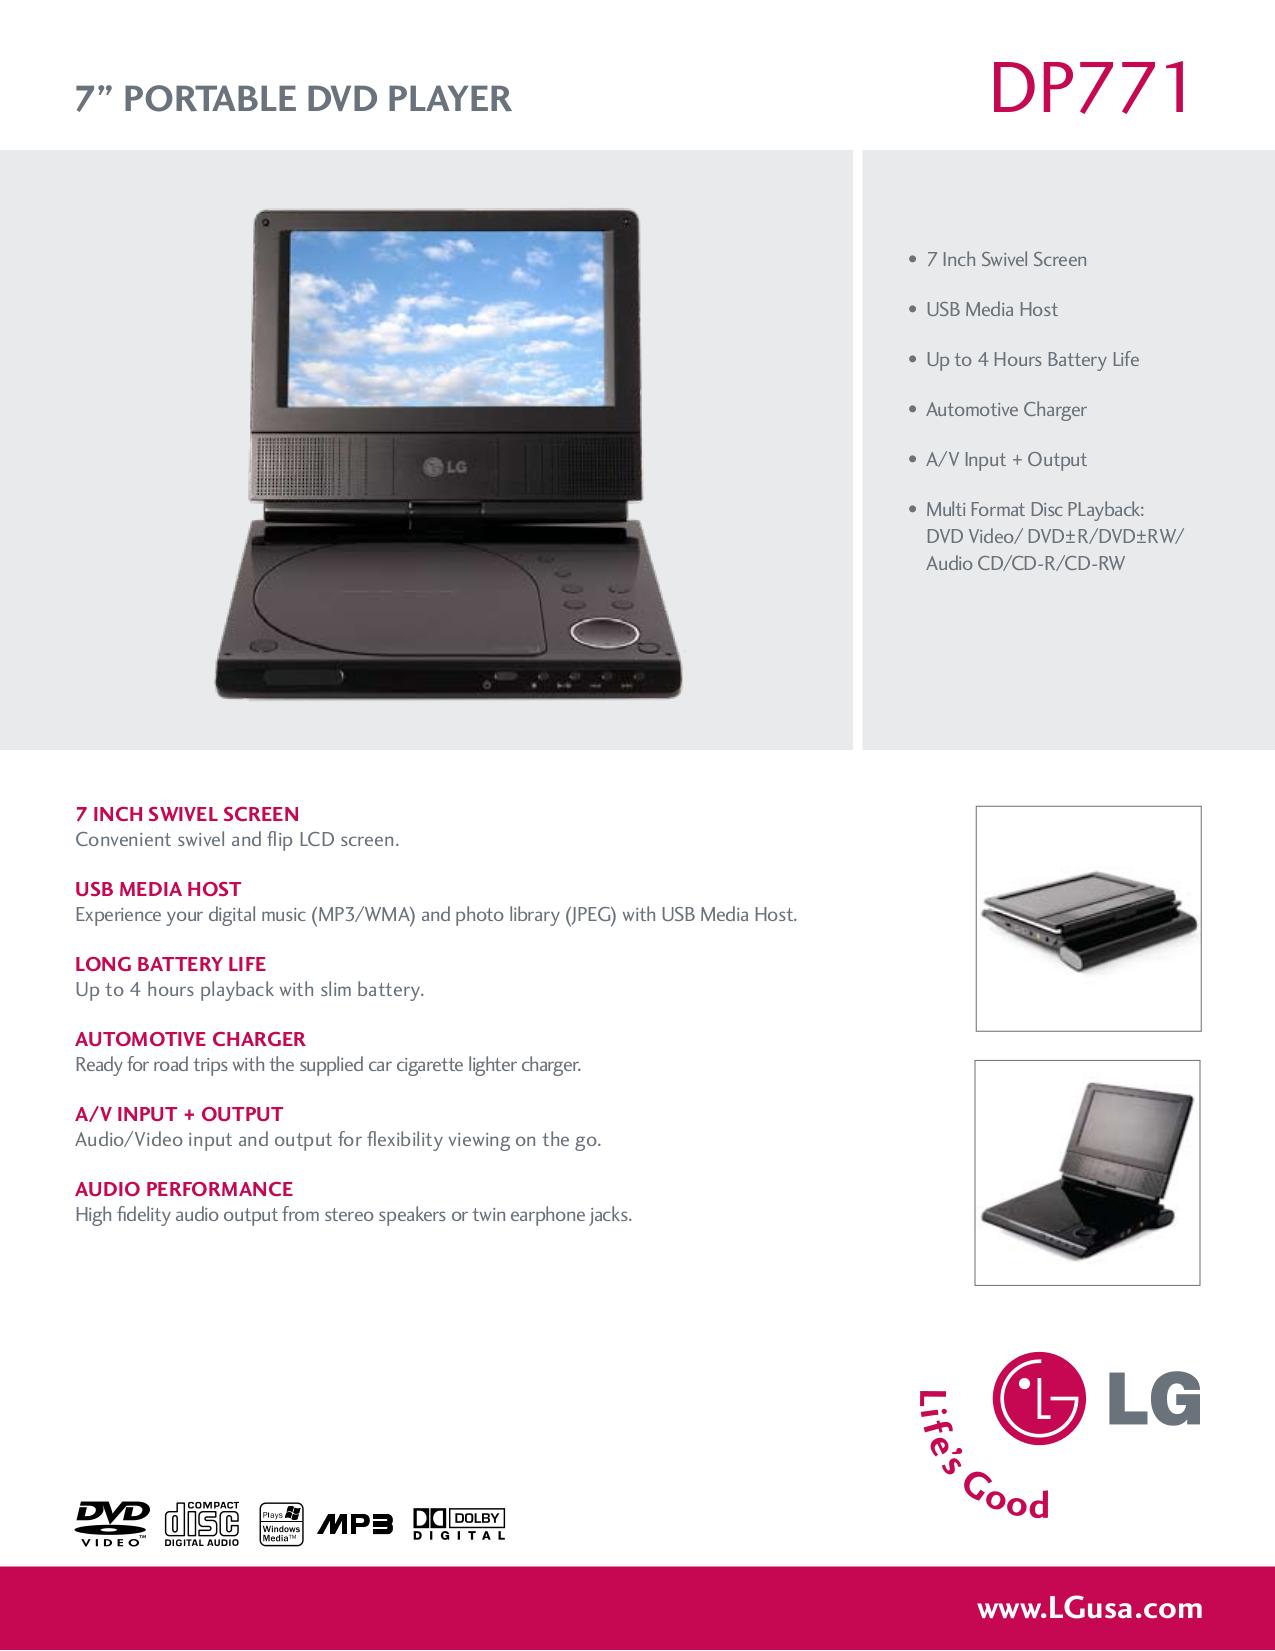 pdf for LG Portable DVD Player DP771 manual